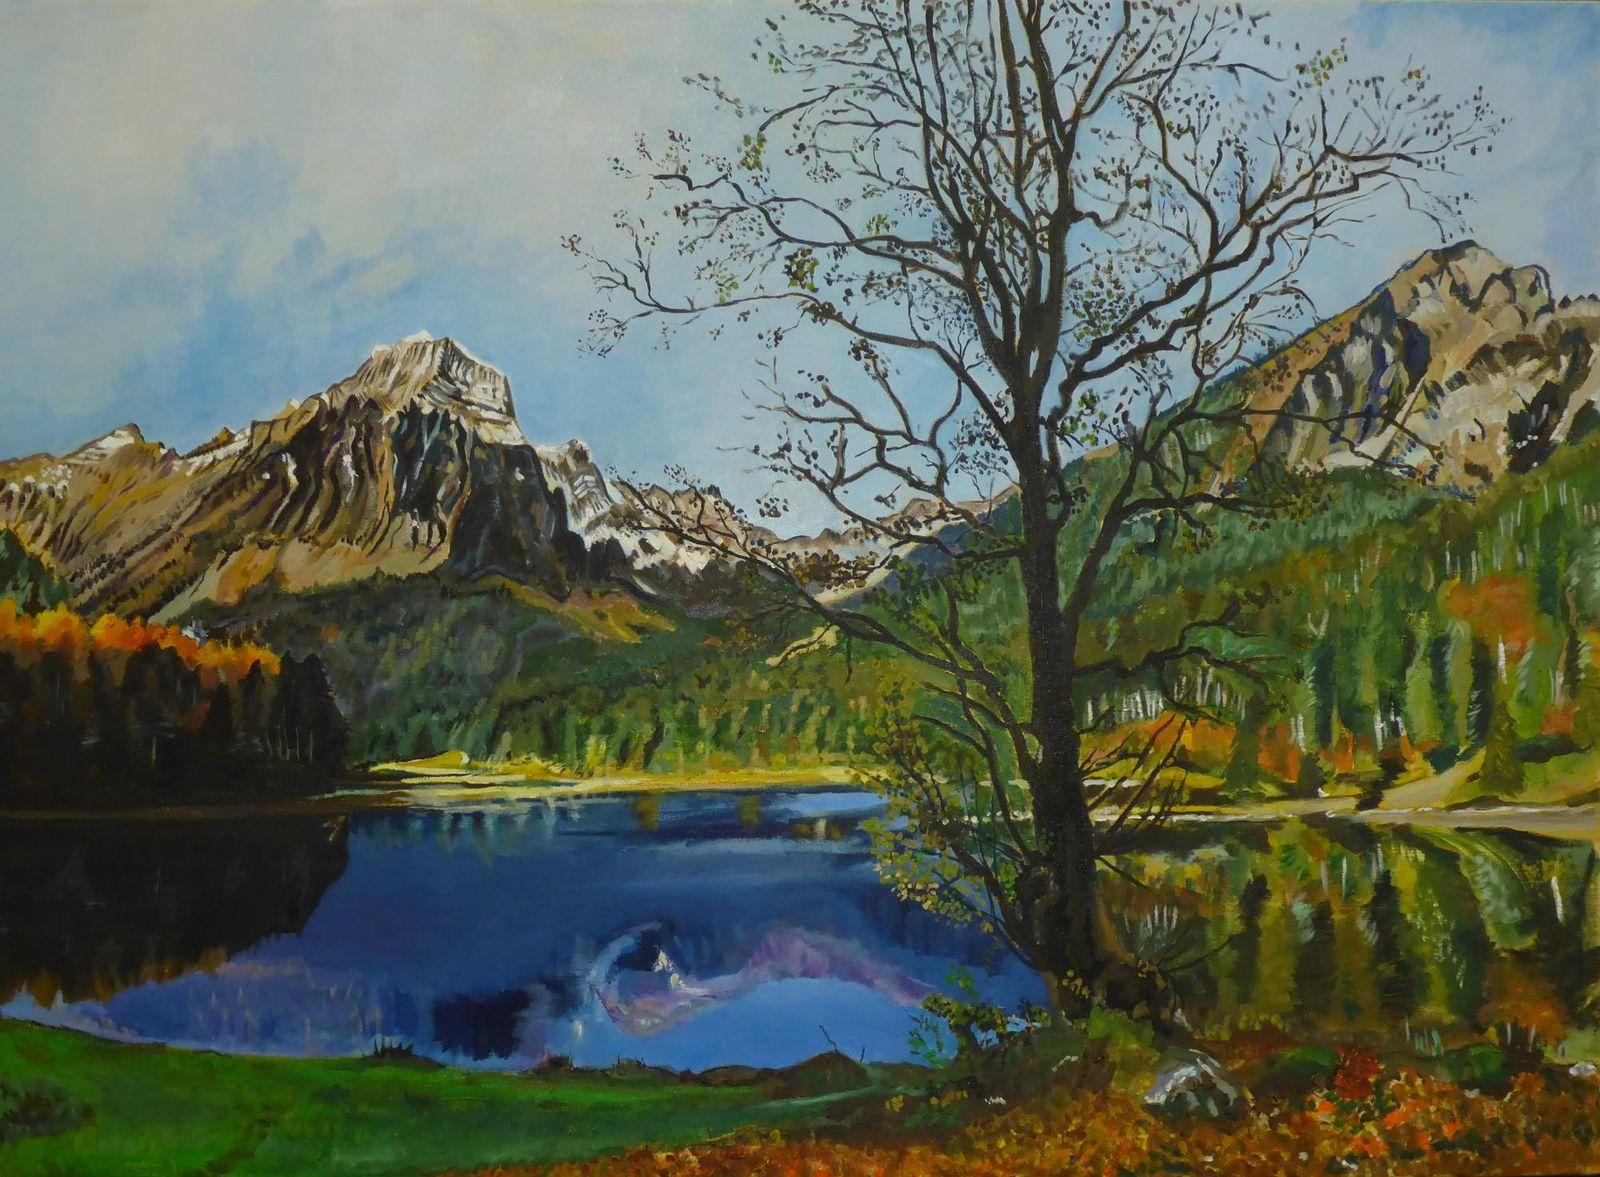 Obersee GL Herbst